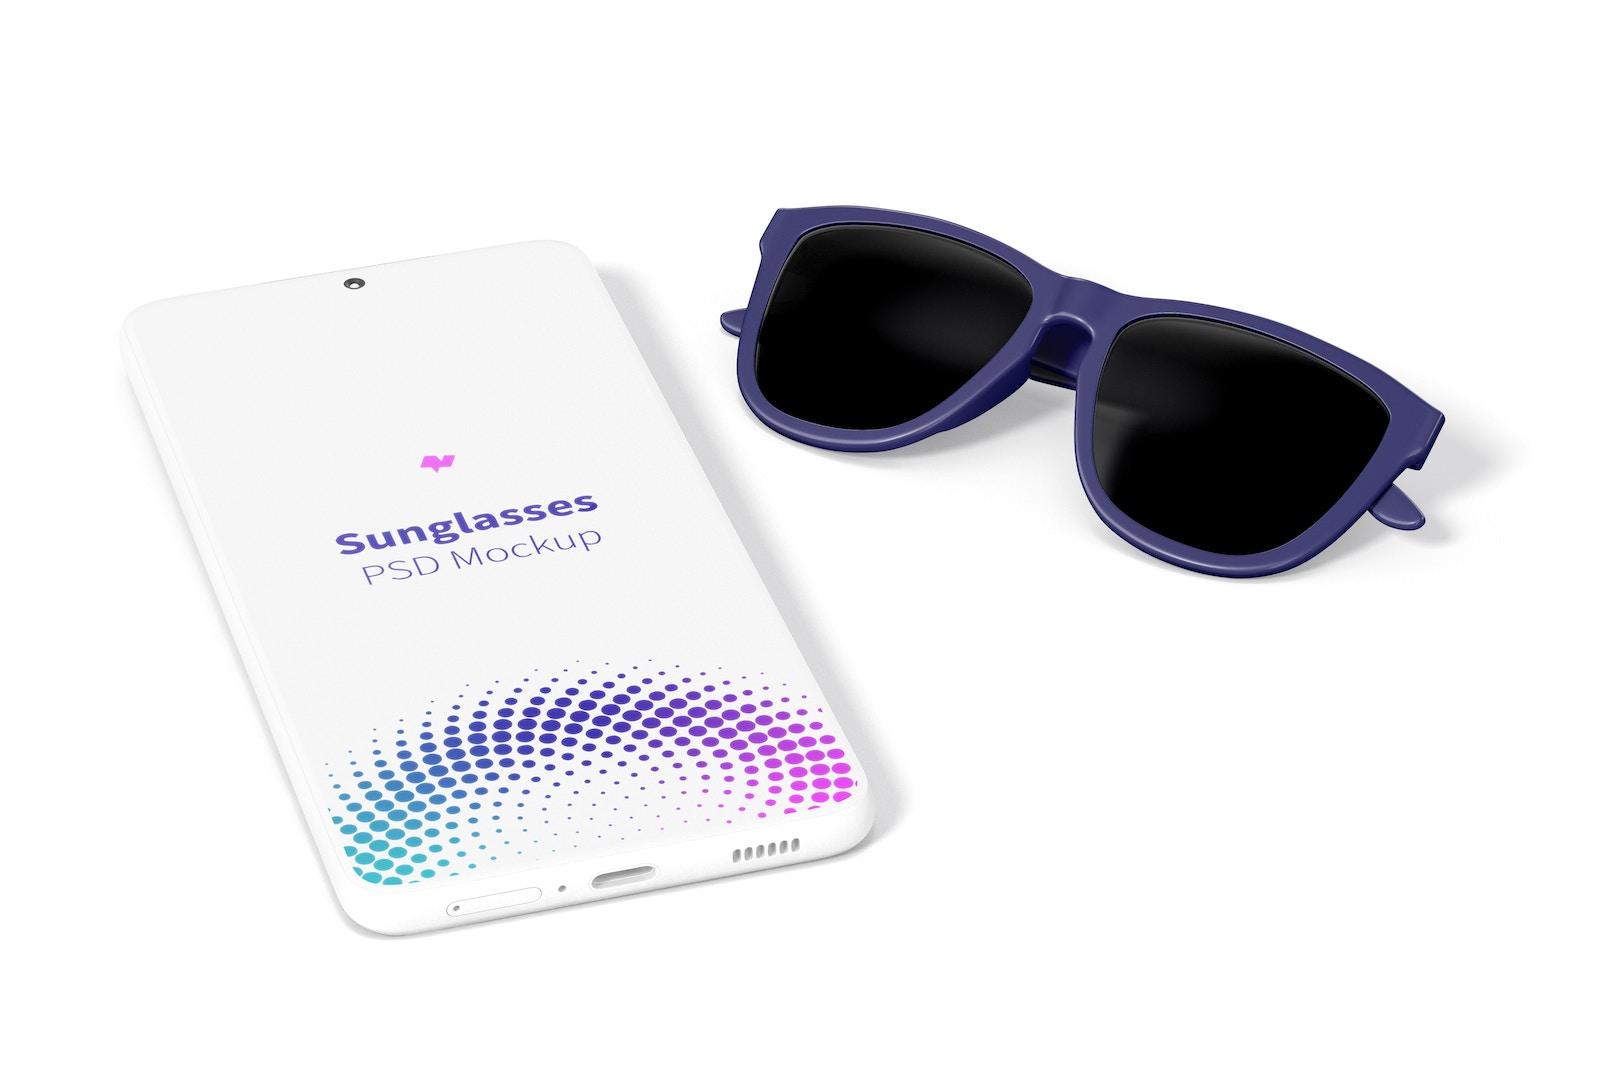 Sunglasses Mockup, Right View